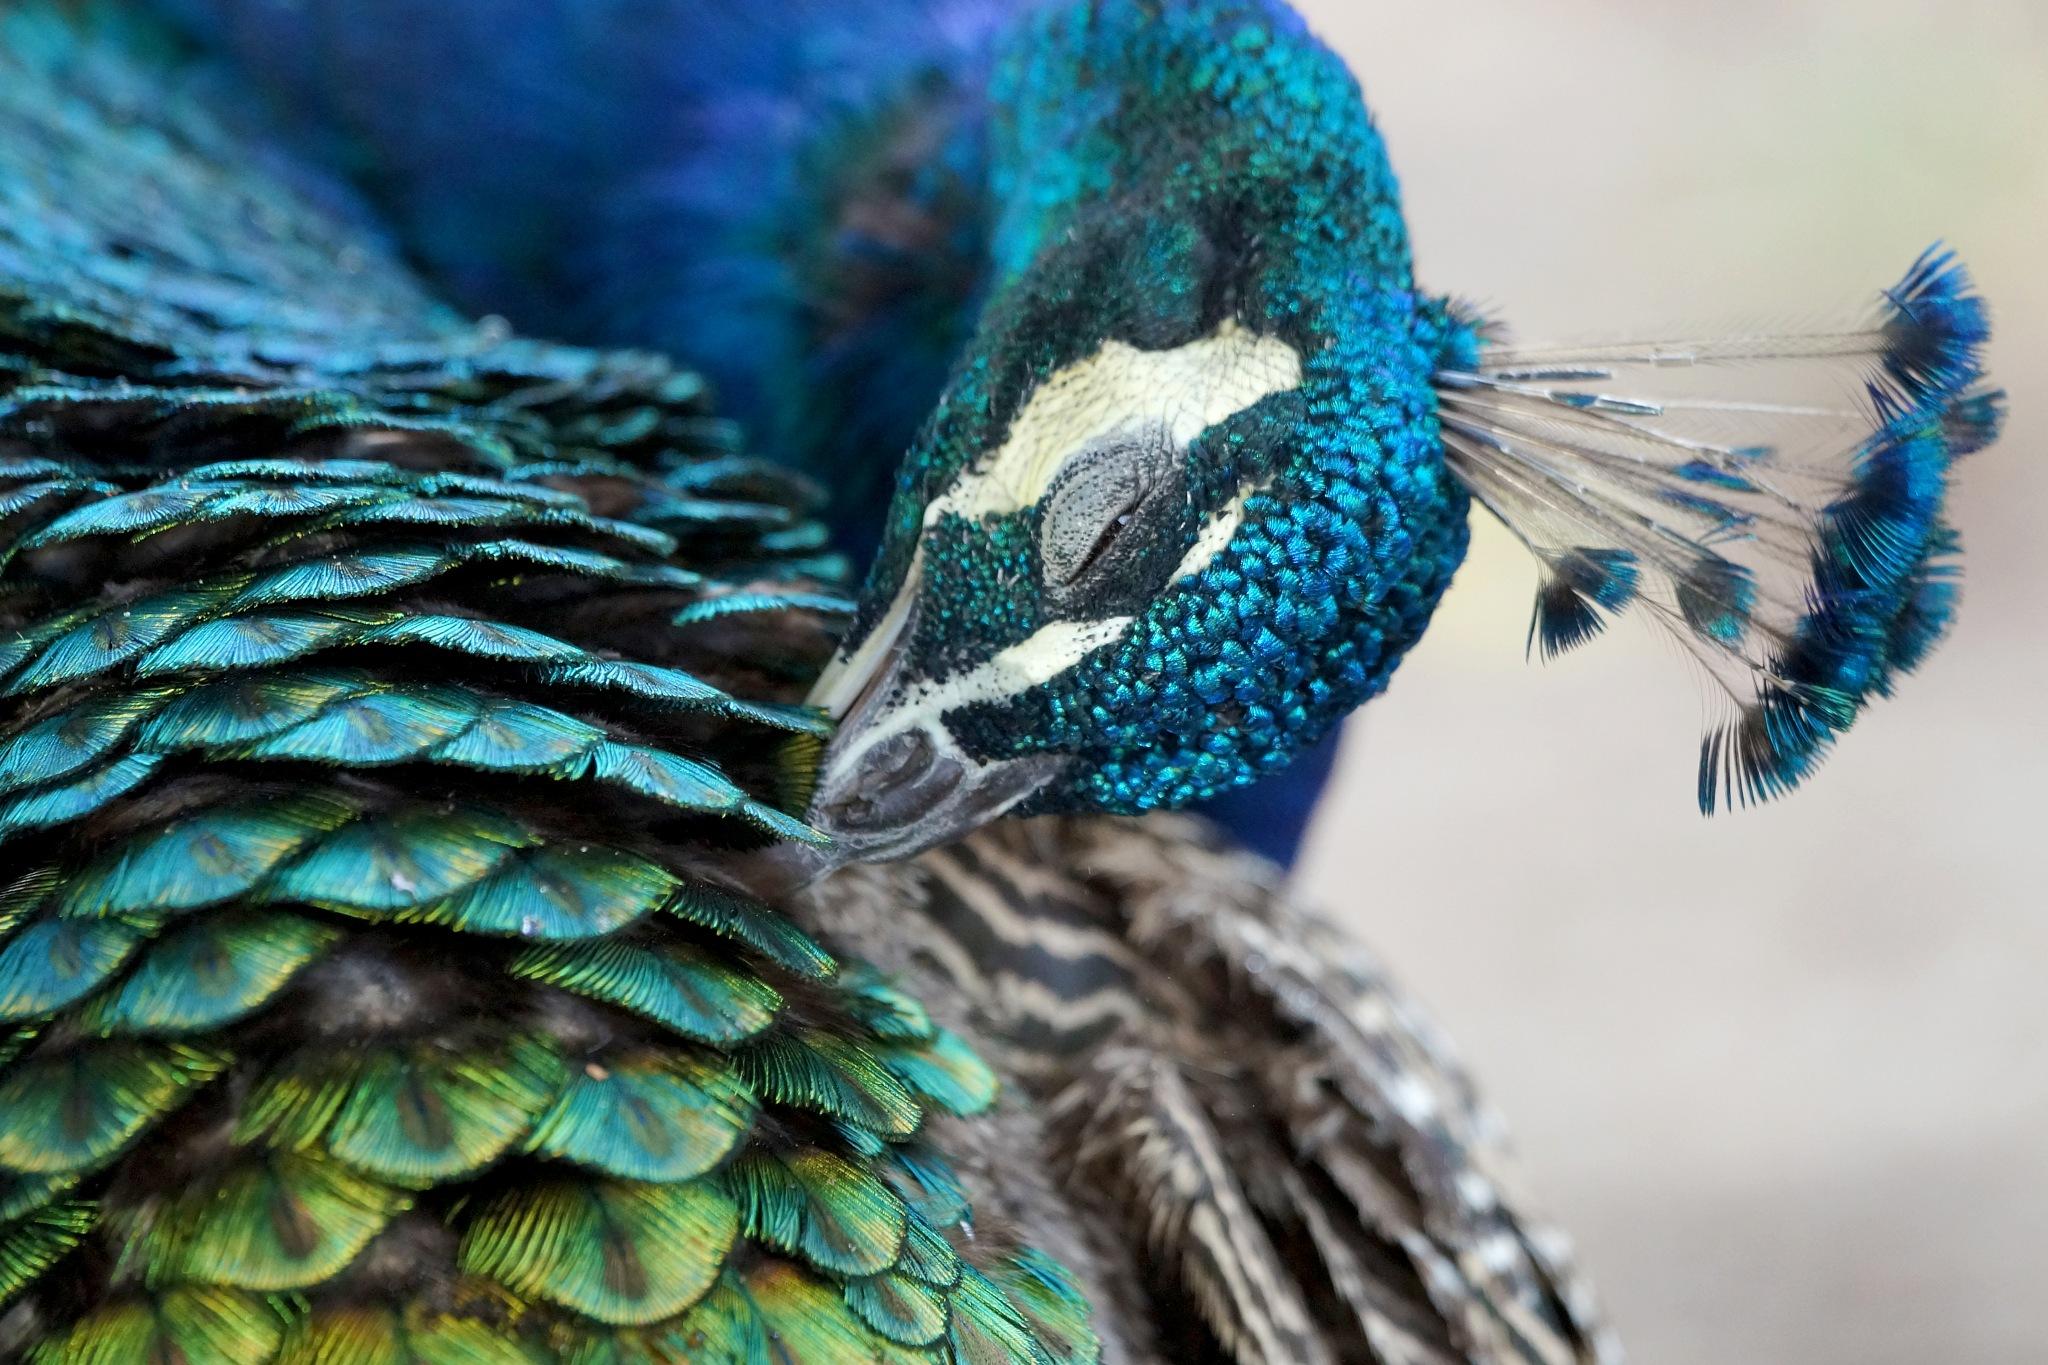 Peacock by PoulErikVistoftNielsen